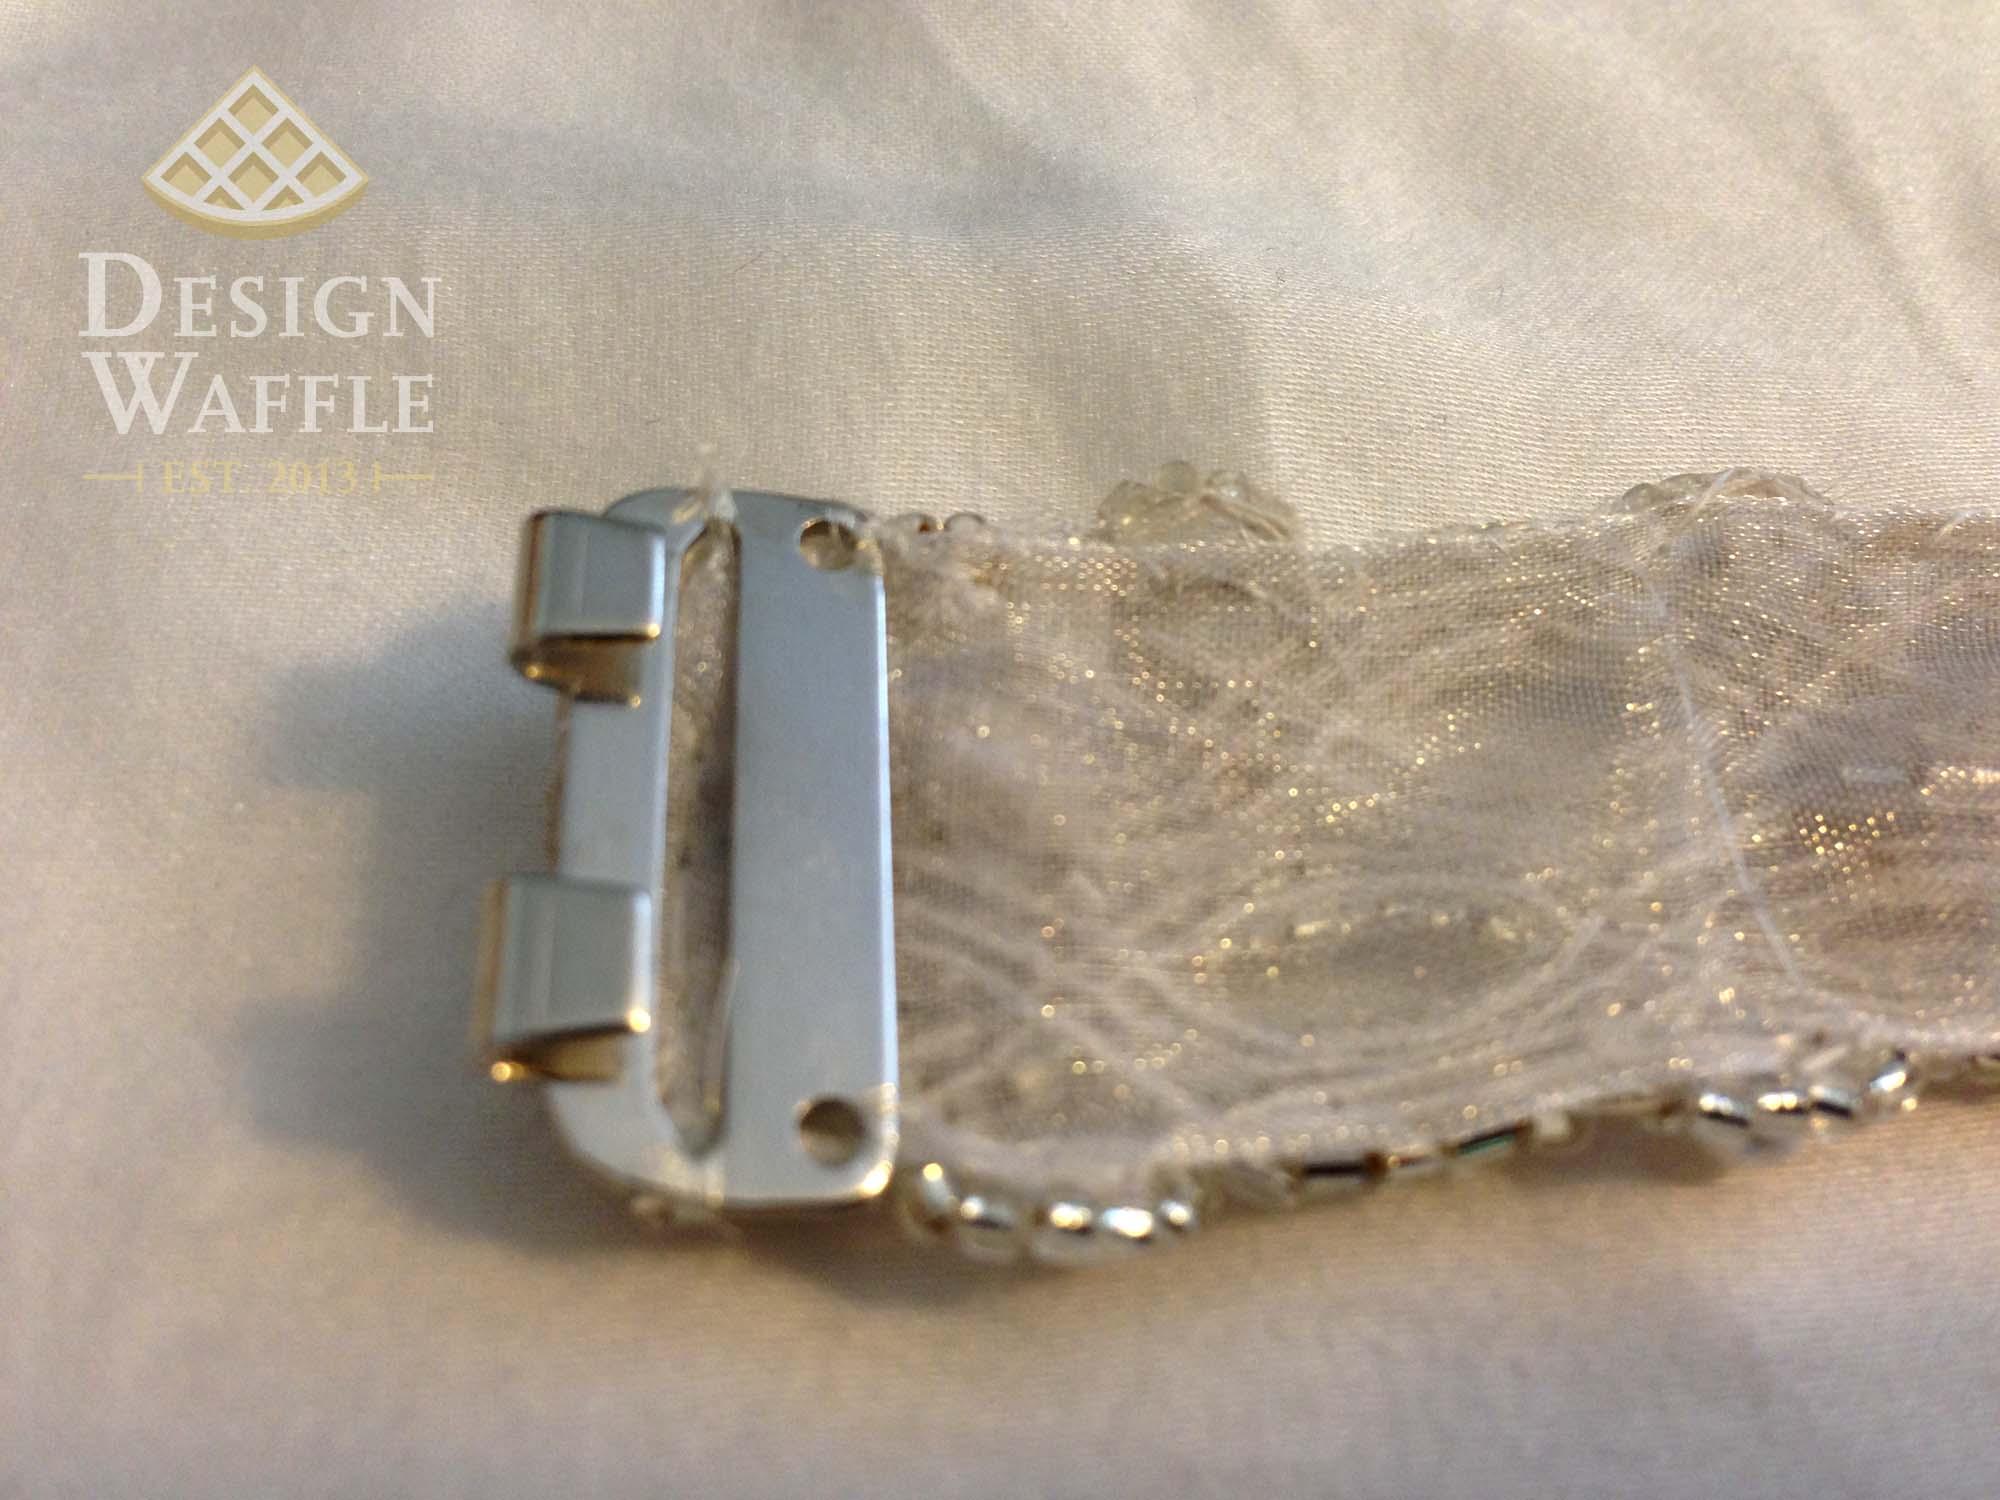 Diy beaded wedding belt design waffle diy wedding belt tutorial clasp solutioingenieria Images